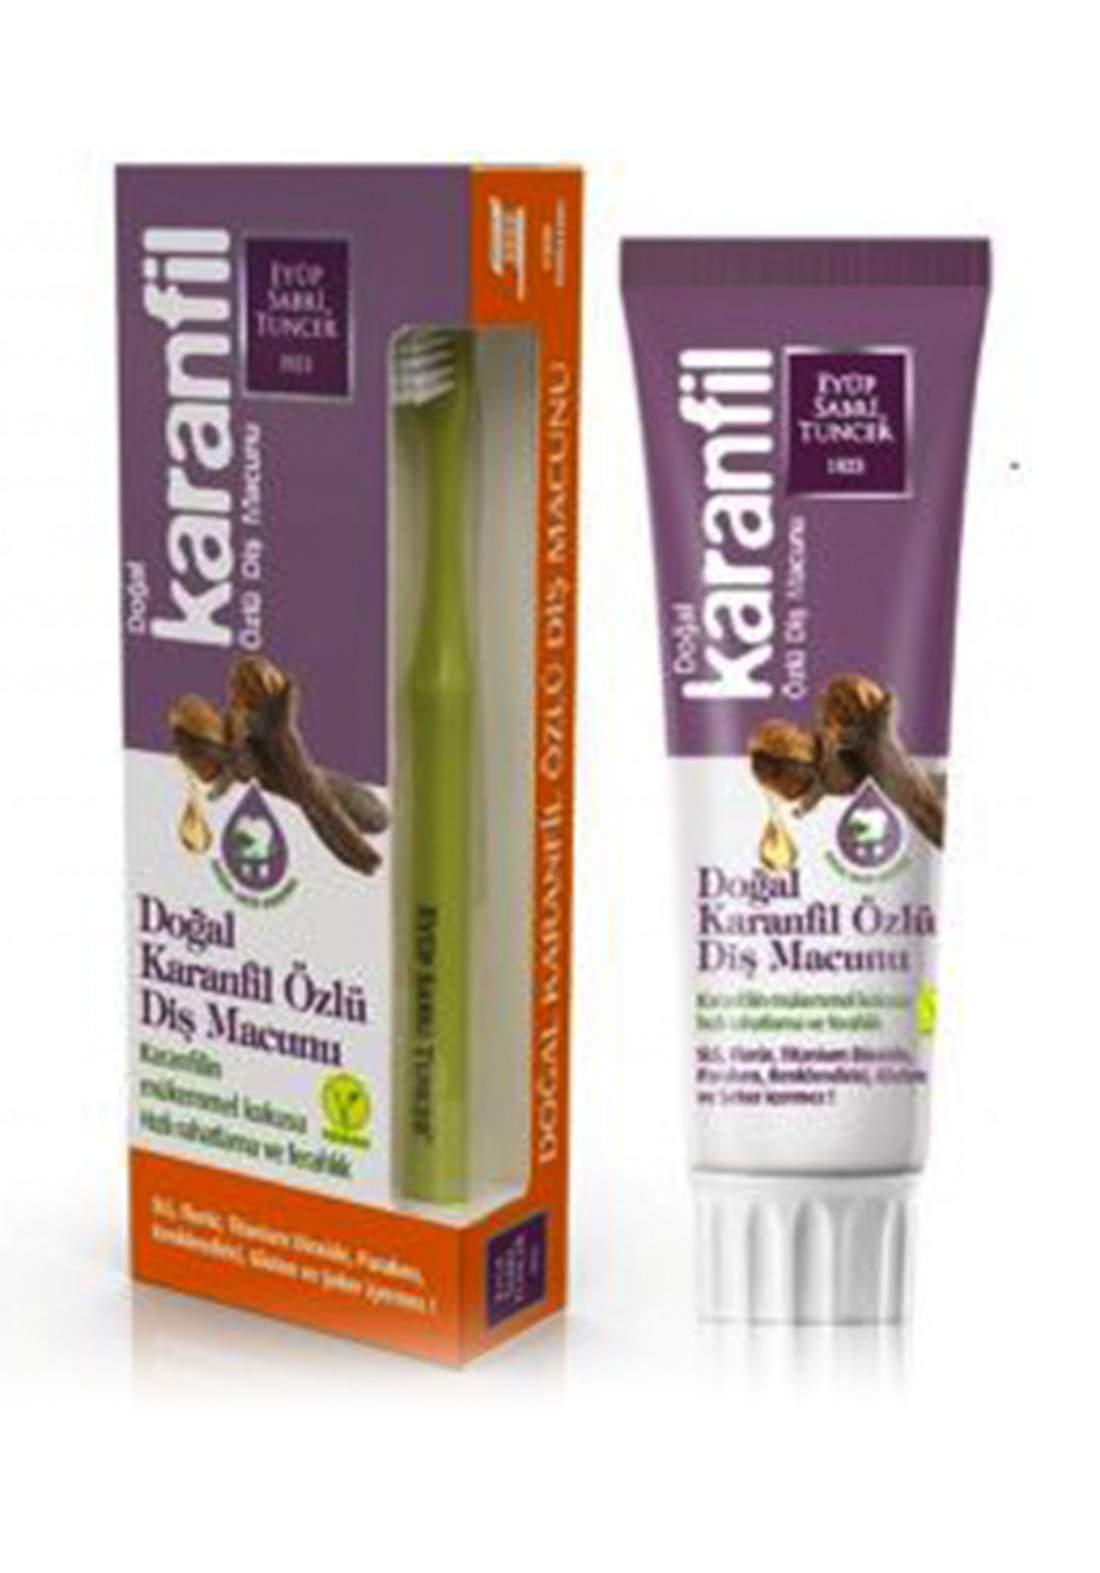 Eyup Sabri Tuncer Natural Clove Extract Toothpaste With Toothbrush 75ml معجون أسنان بالقرونفل مع فرشاة